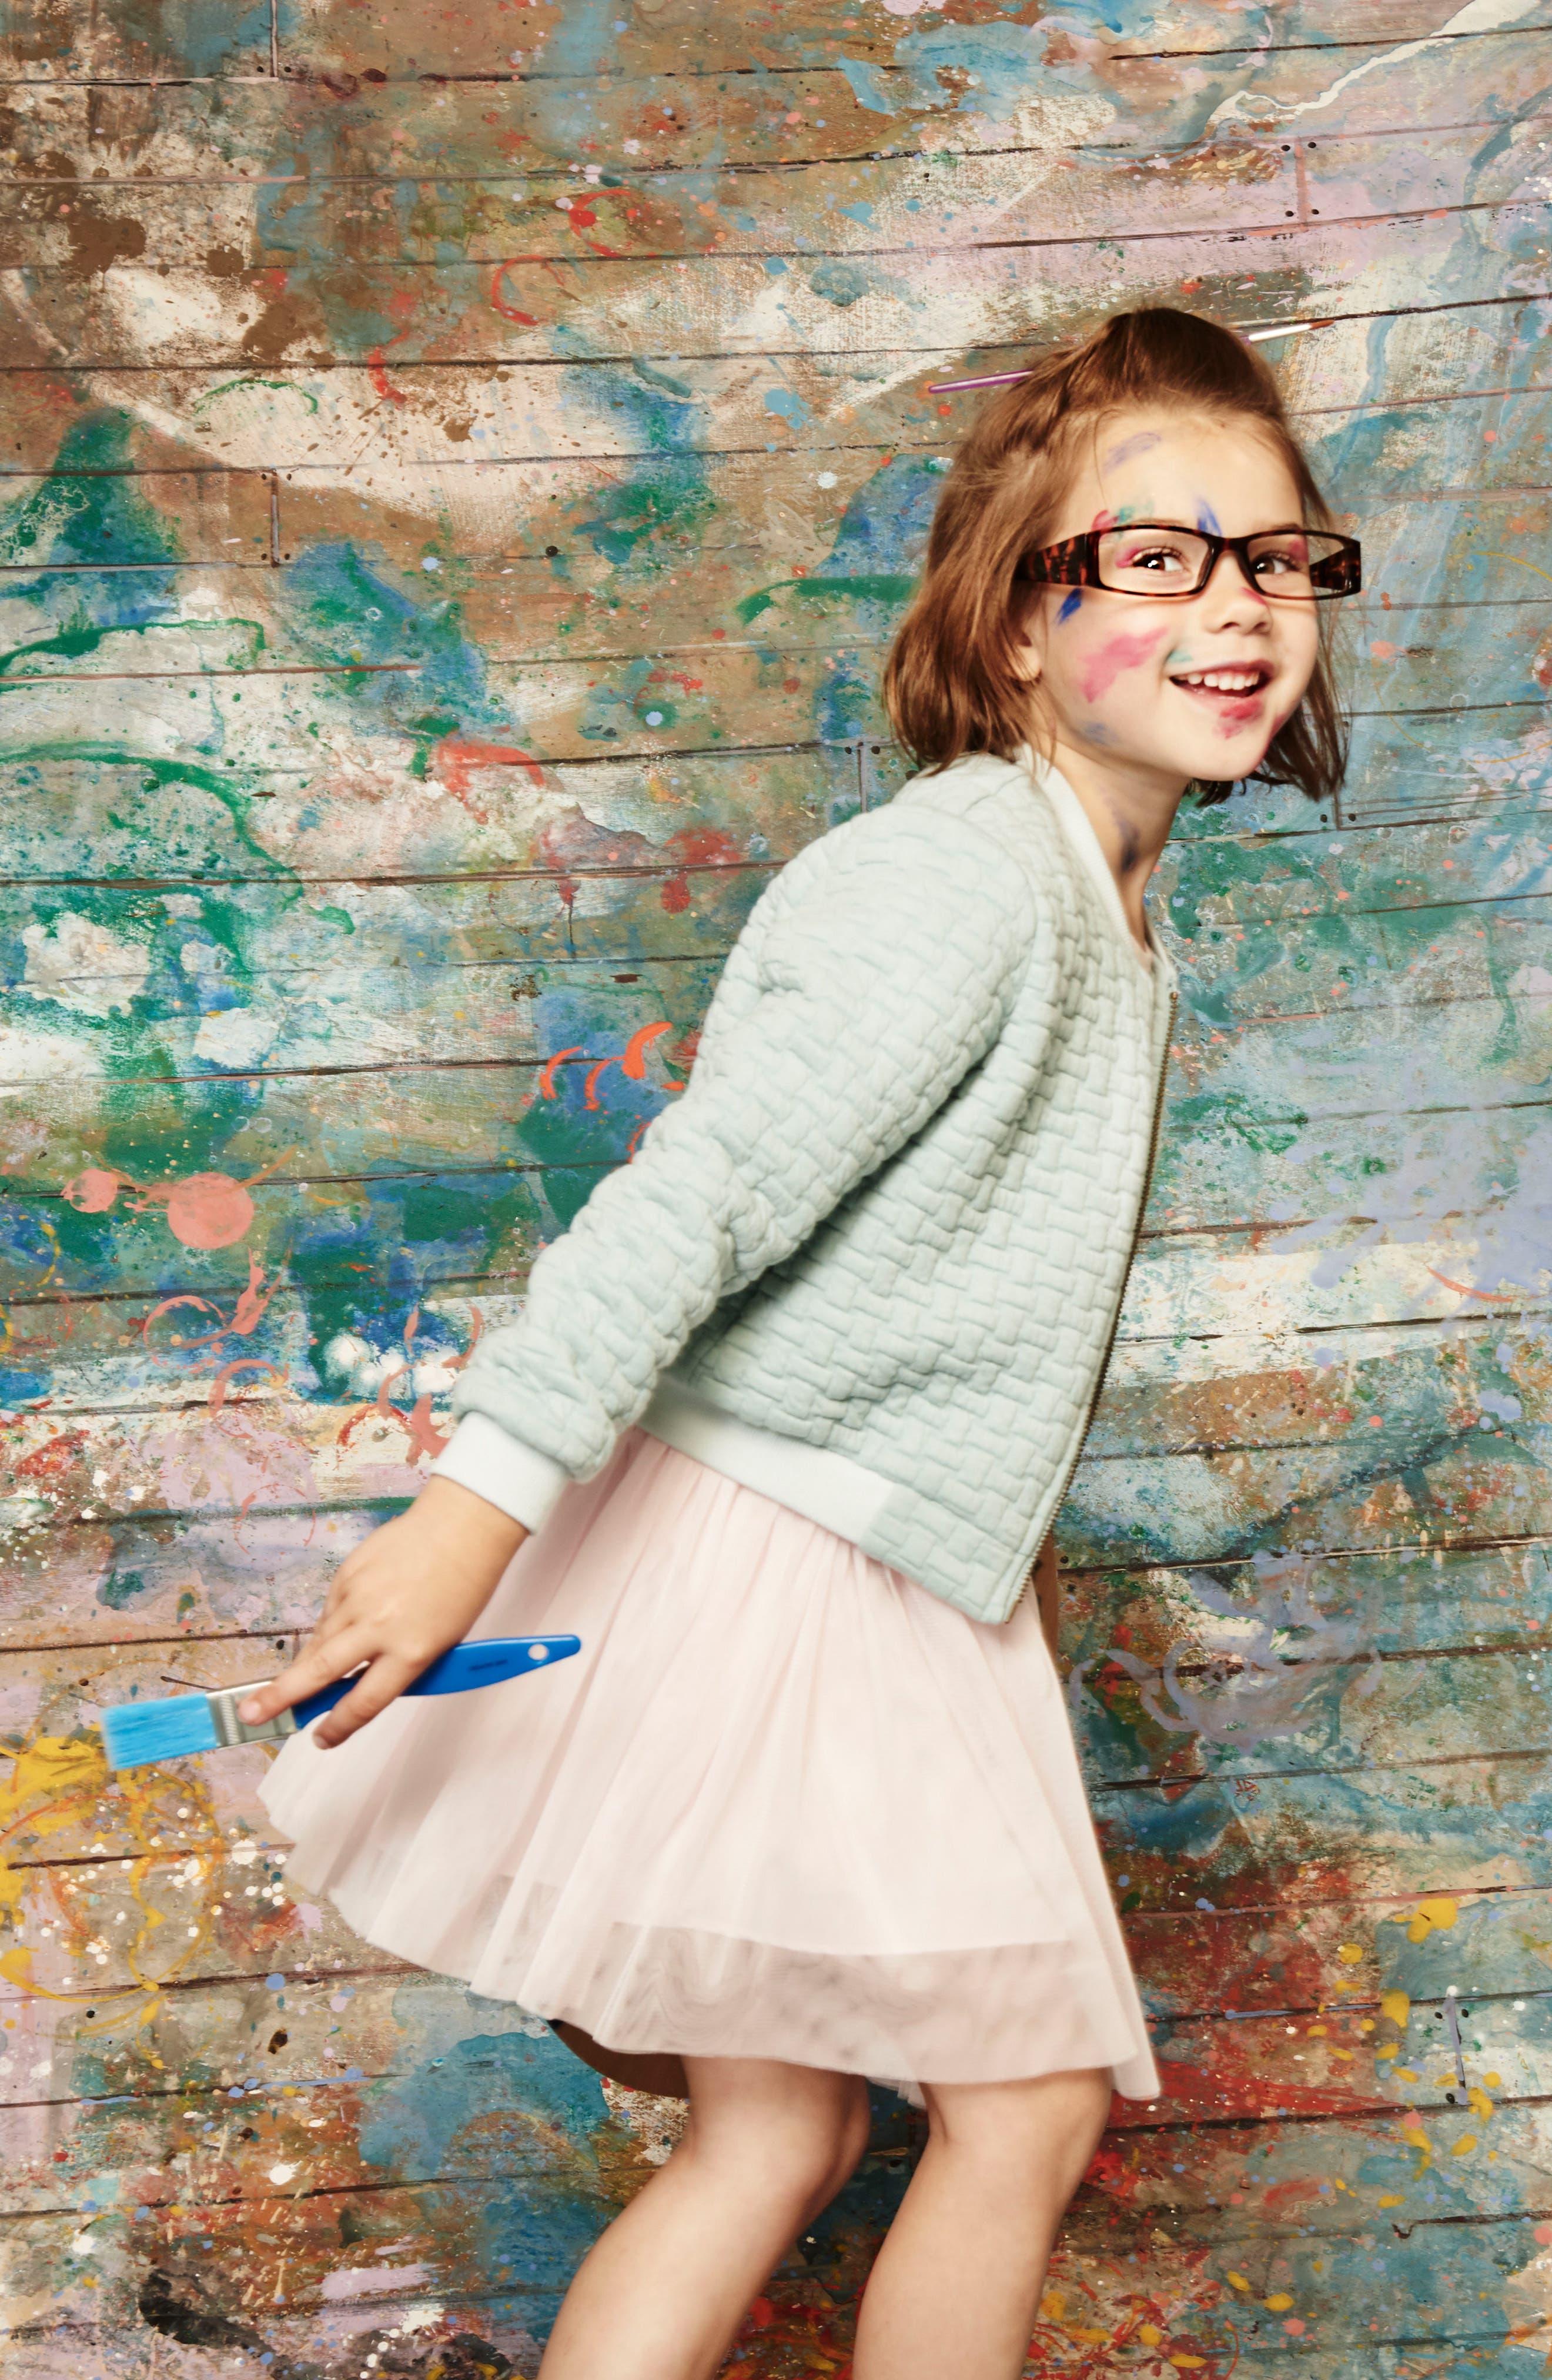 Alternate Image 4  - Pippa & Julie Bomber Jacket & Tulle Dress Set (Toddler Girls & Little Girls)